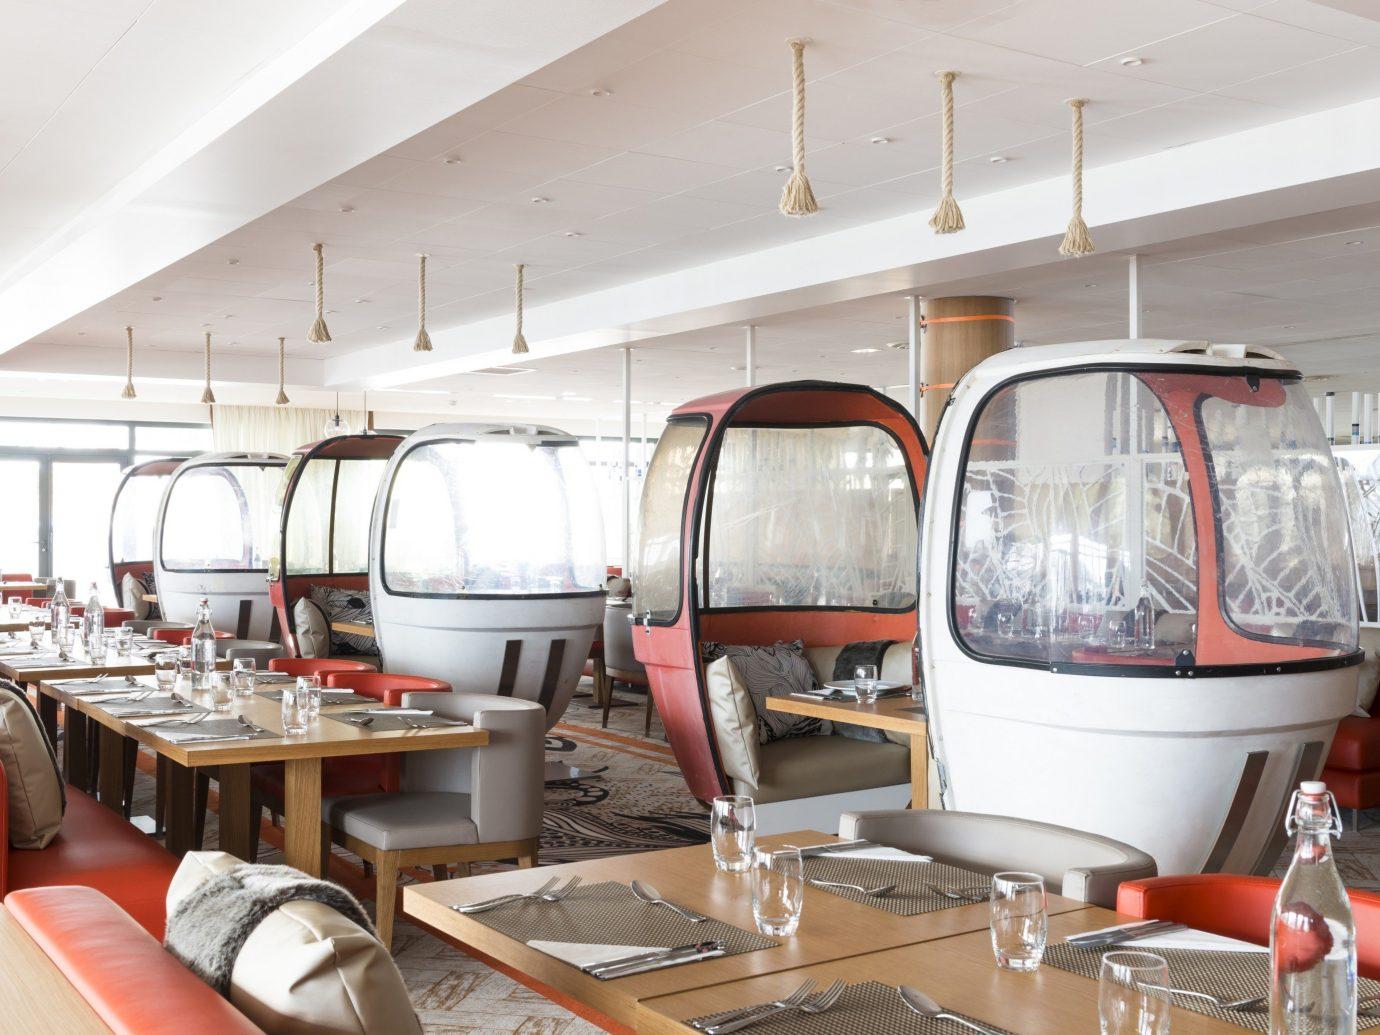 All-Inclusive Resorts Family Travel Hotels interior design restaurant